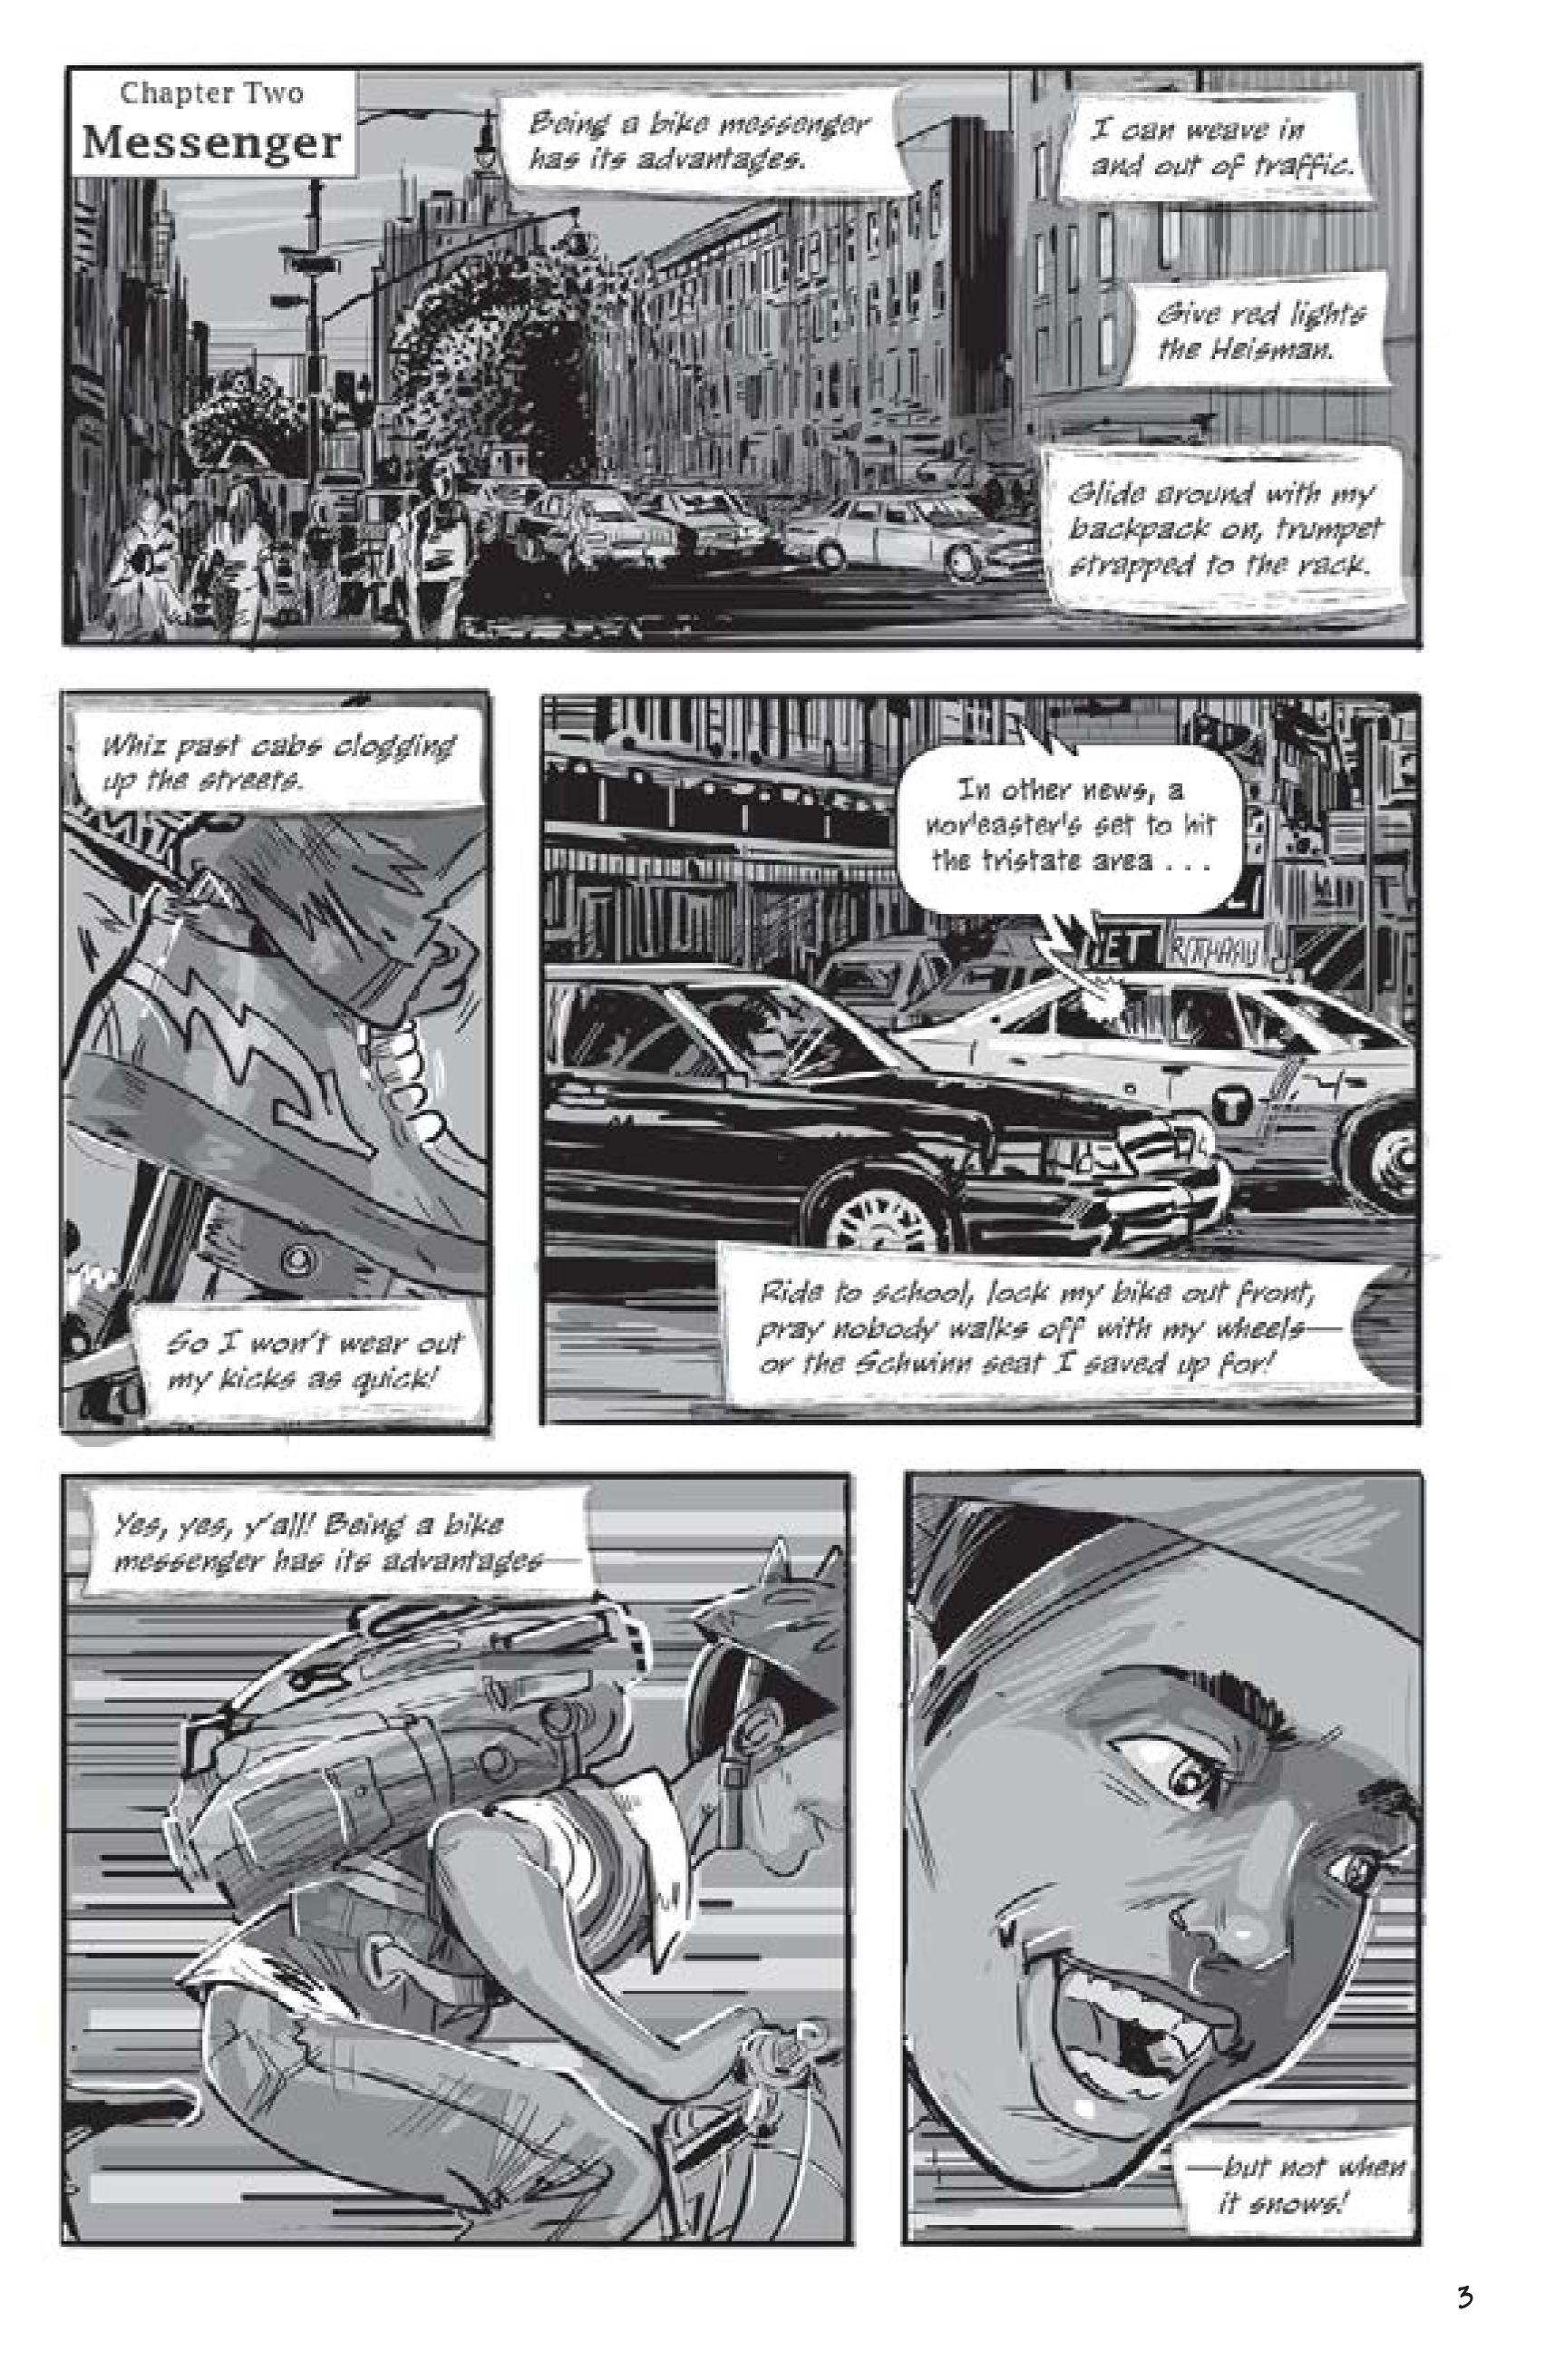 I Am Alfonso Jones  Black Lives Matter Graphic Novel  Lee  Low Books Thumbiamalfonsojonesspread  Thumbiamalfonsojonesspread   Thumbiamalfonsojonesspread Sample English Essay also High School Sample Essay  Writing Help Center